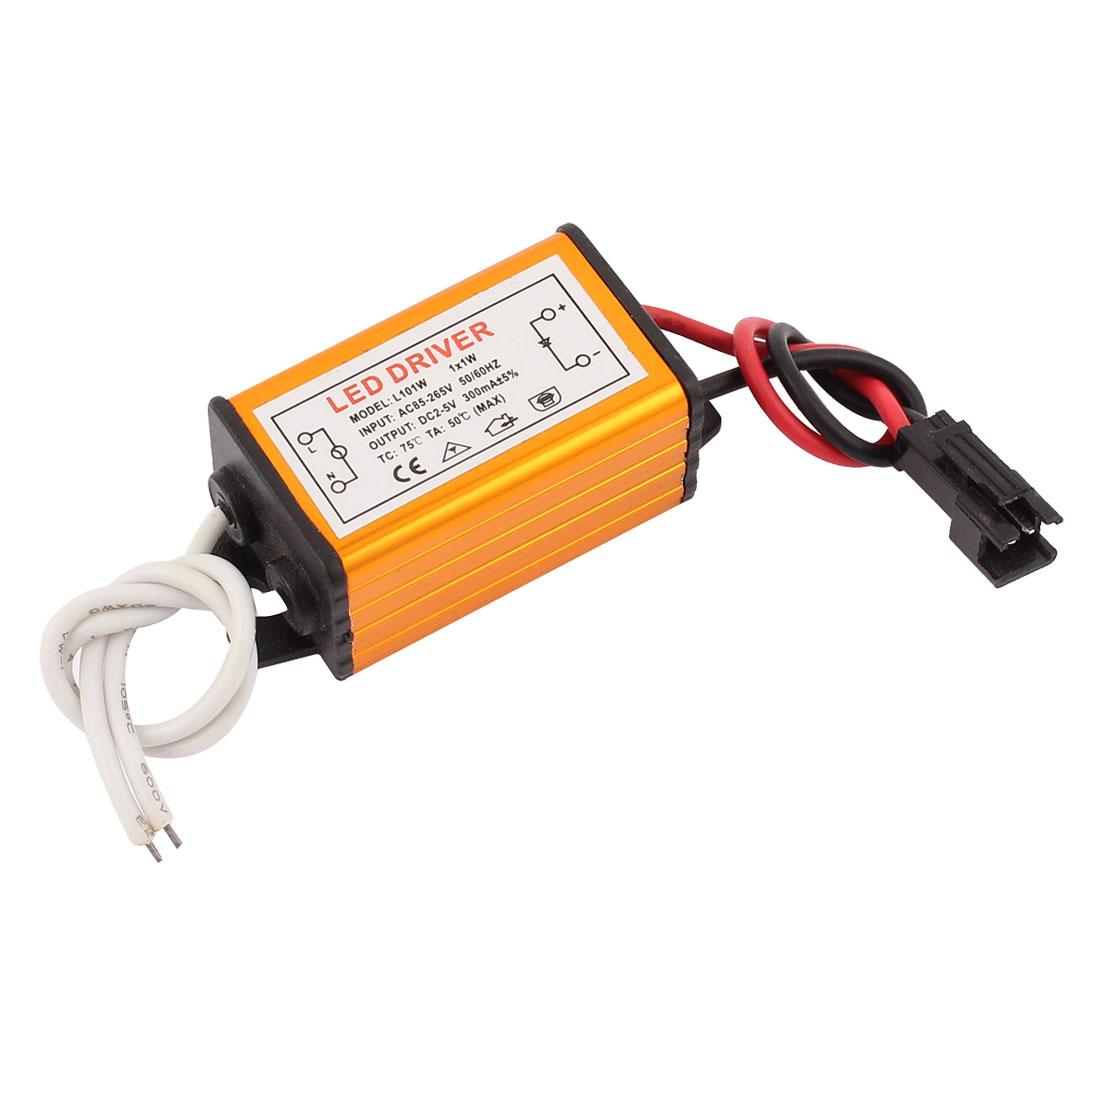 1x1W AC 85V-265V to DC 2V-5V 300mA Power Supply Driver for LED Light